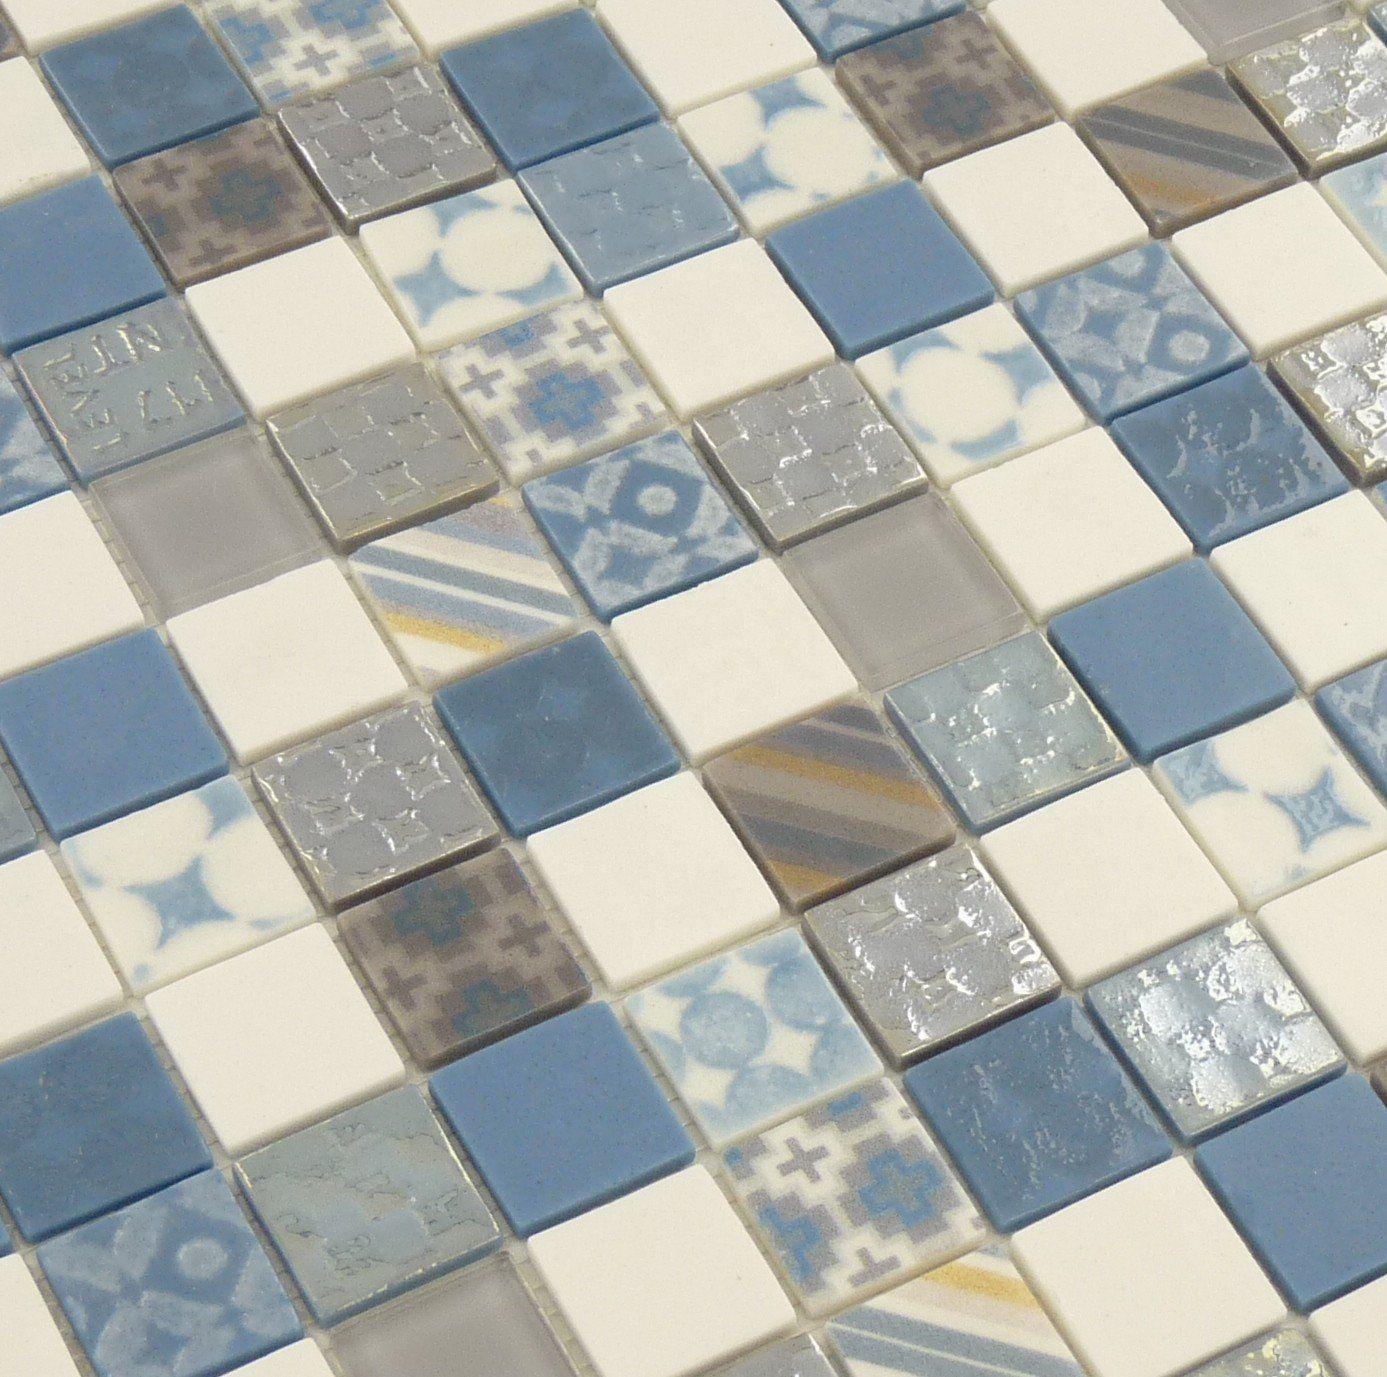 Tesoro 1 X 1 Blue Glass Square Tile Glossy Matte Onicosmzambra Glass Pool Tile Blue Glass Glass Tile